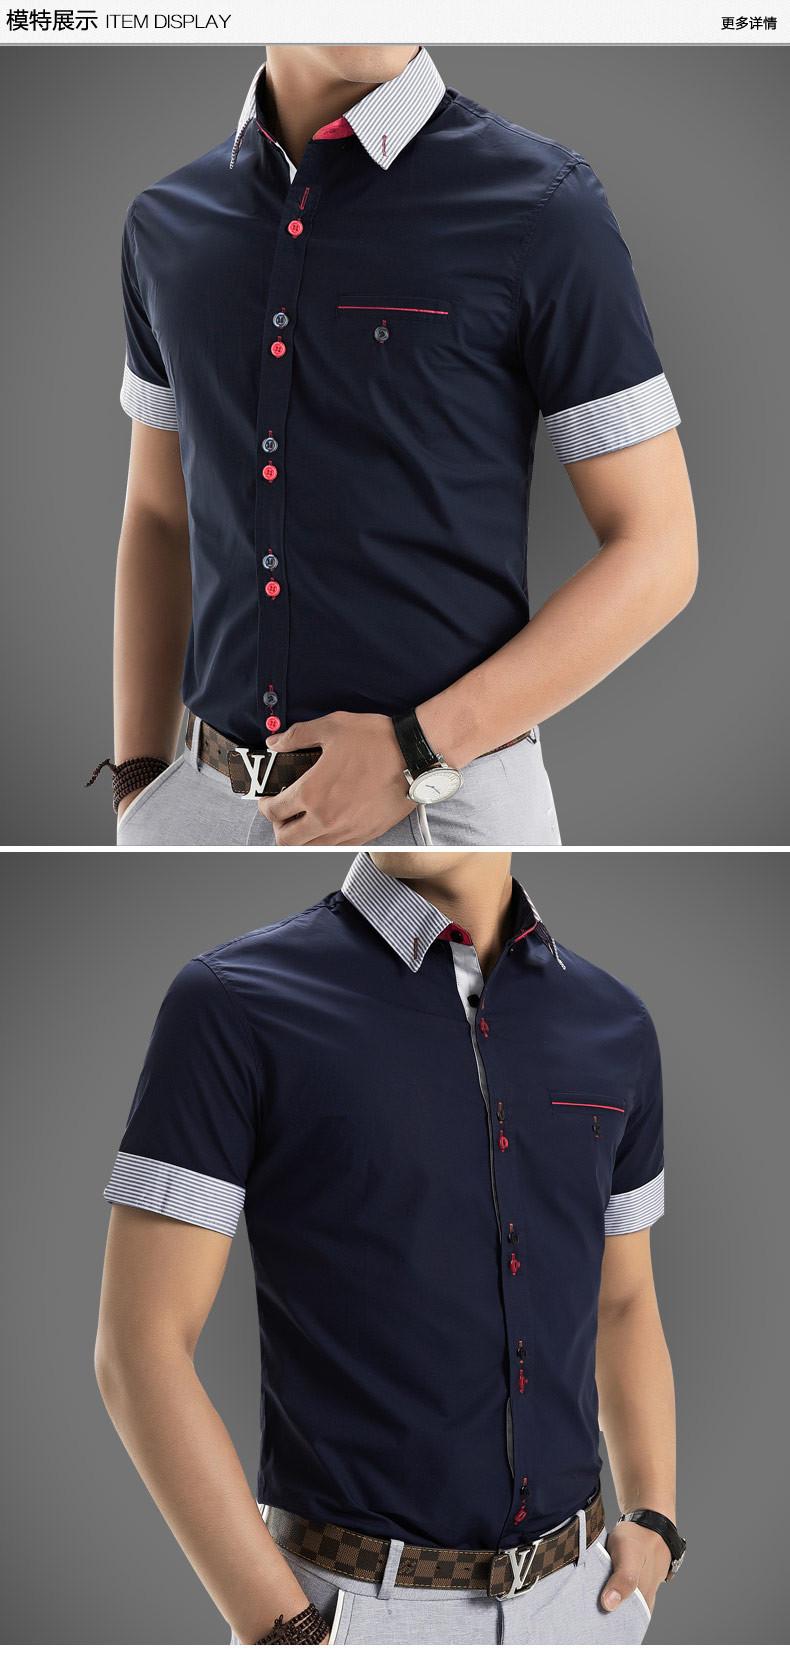 2015 Men Shirt New Brand Shirts Short Sleeve Casual Shirt Men Slim Fit Brand Design Formal Shirt Camisa Social Chemise Homme1